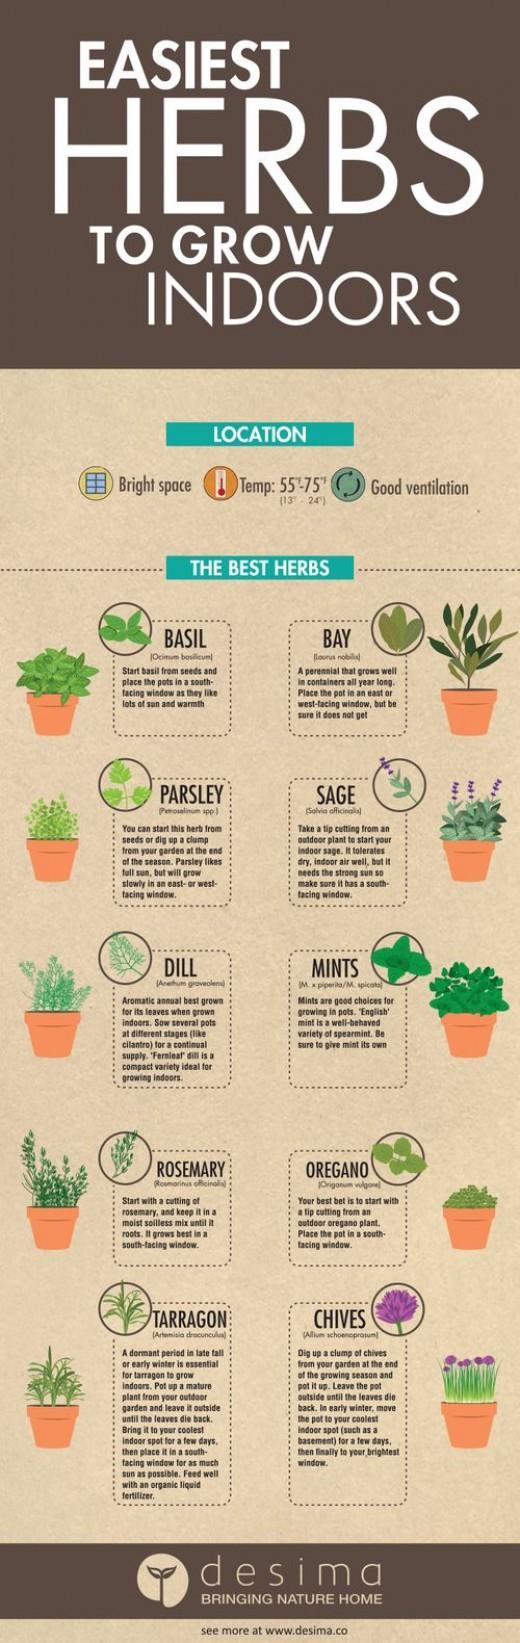 Diy-Herb-Garden